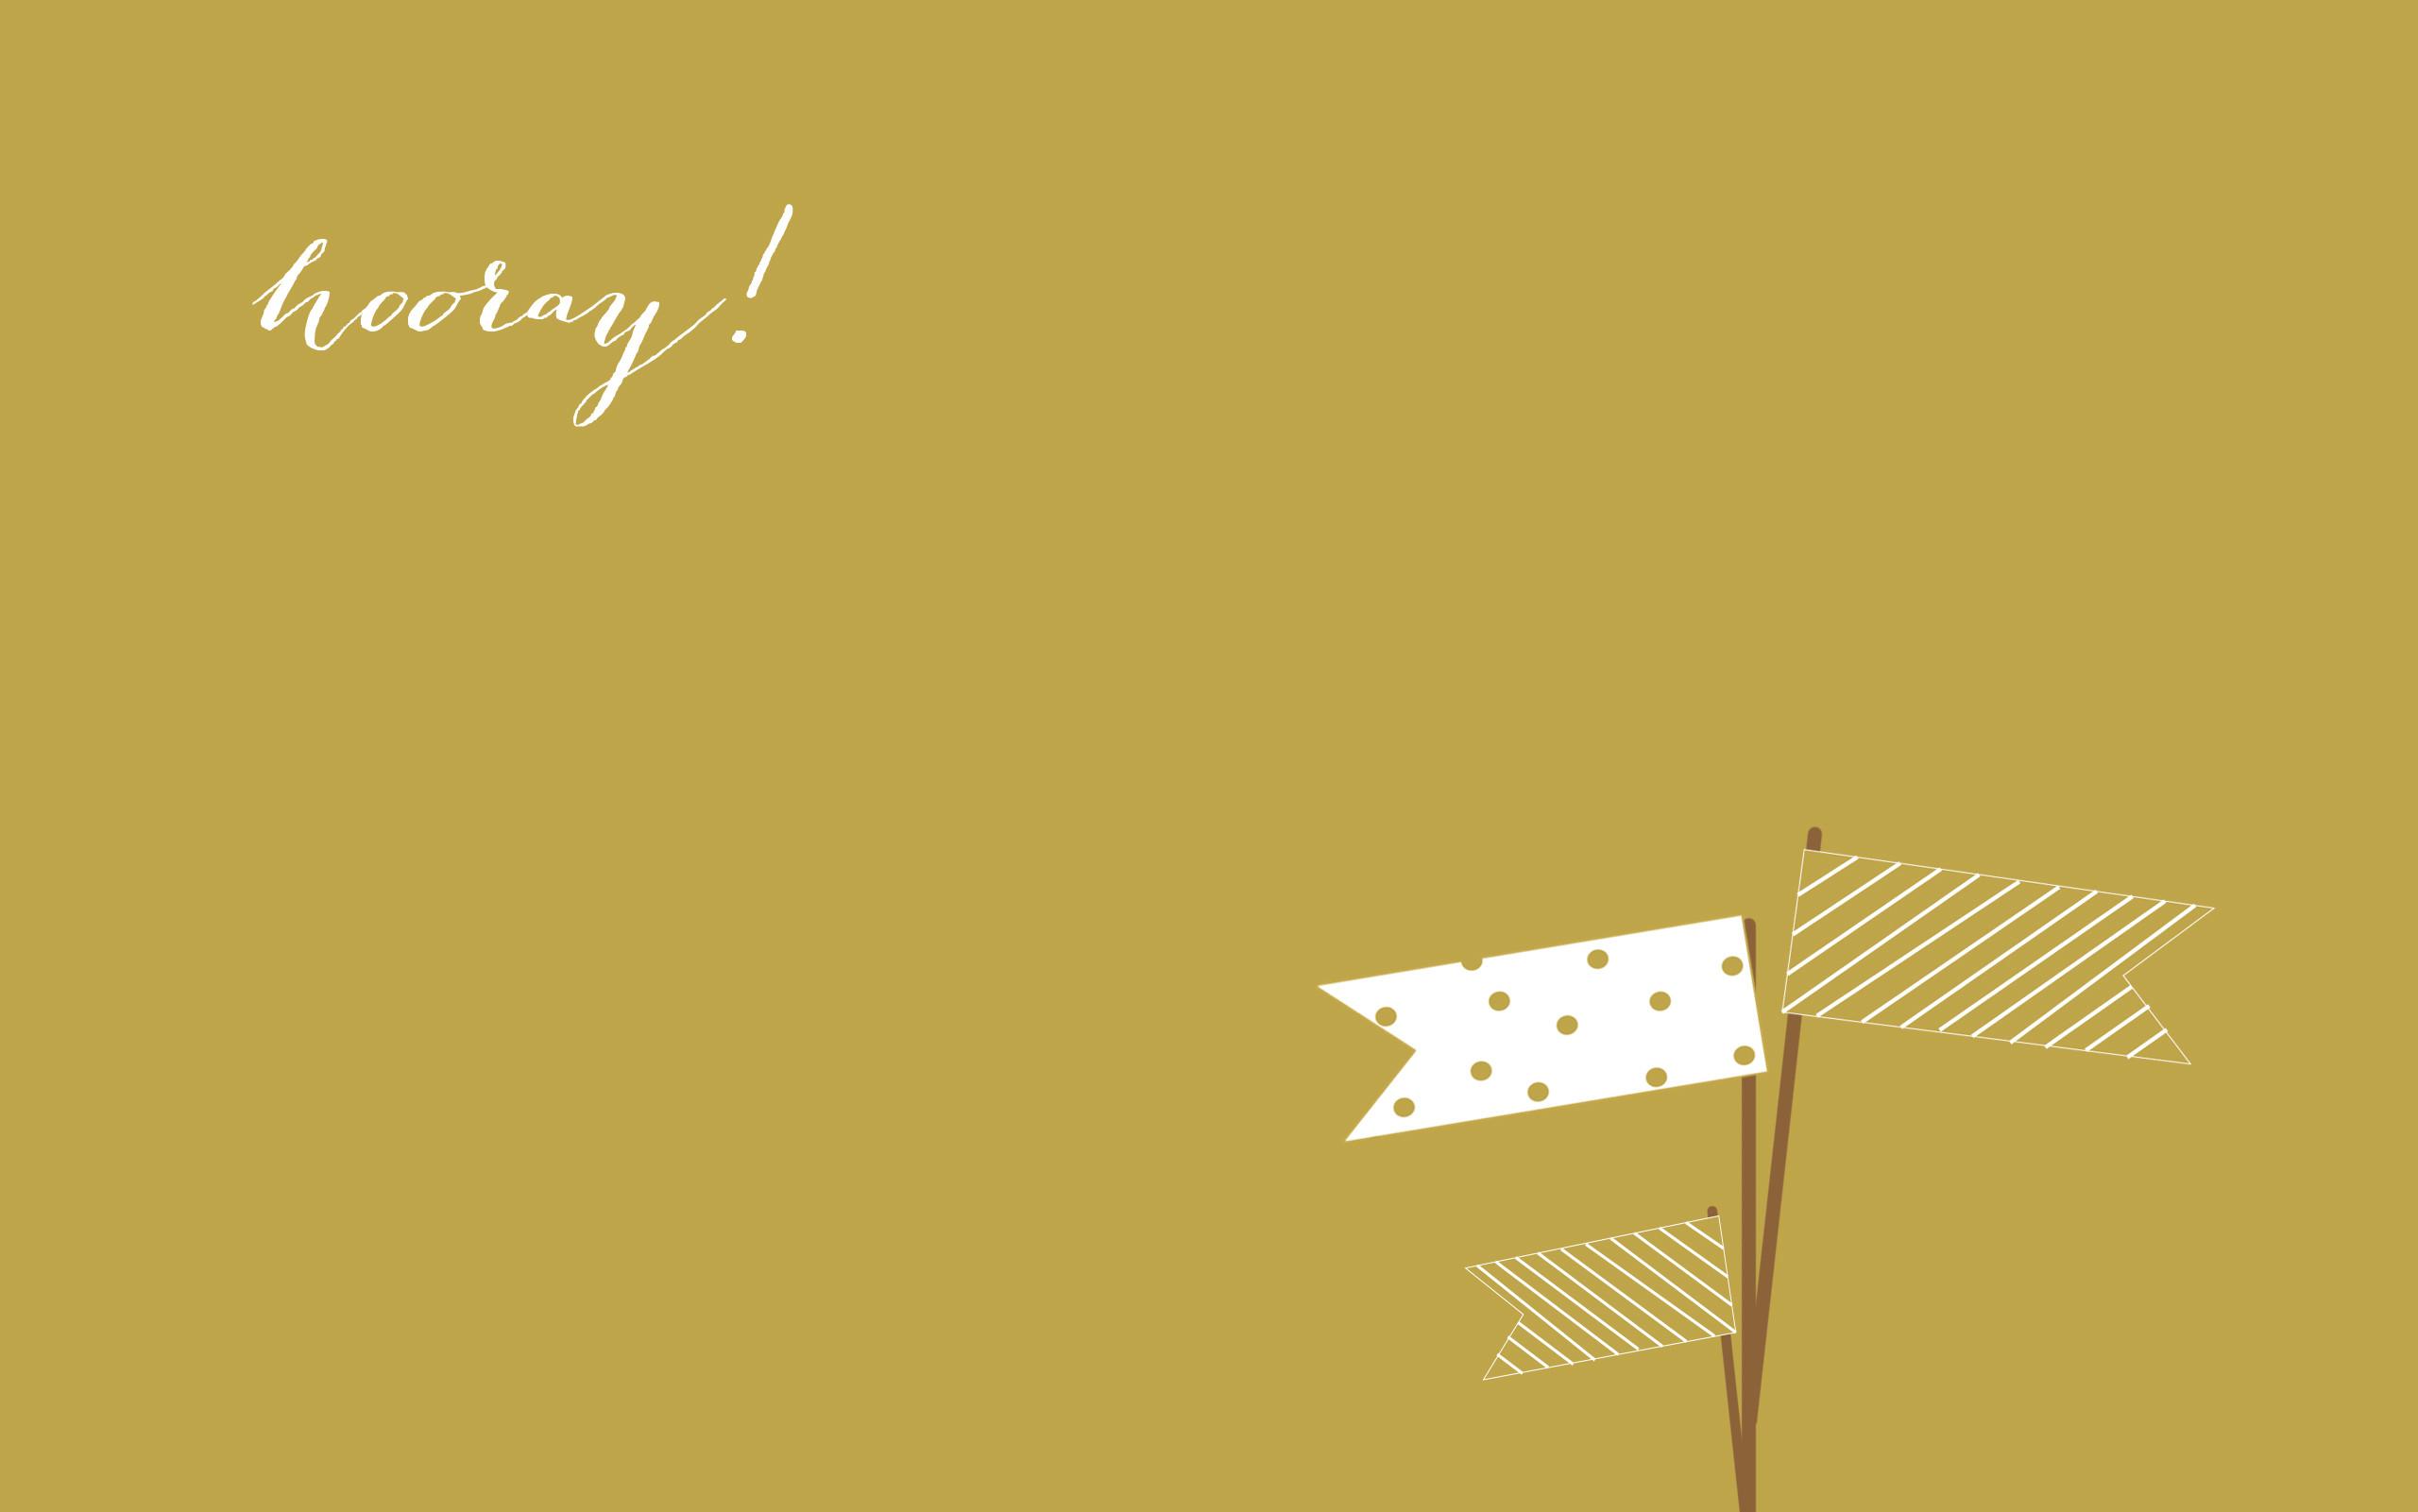 Polka Dot Dream Wallpaper Stripe_happyday_Wallpaper Hooray_Wallpaper